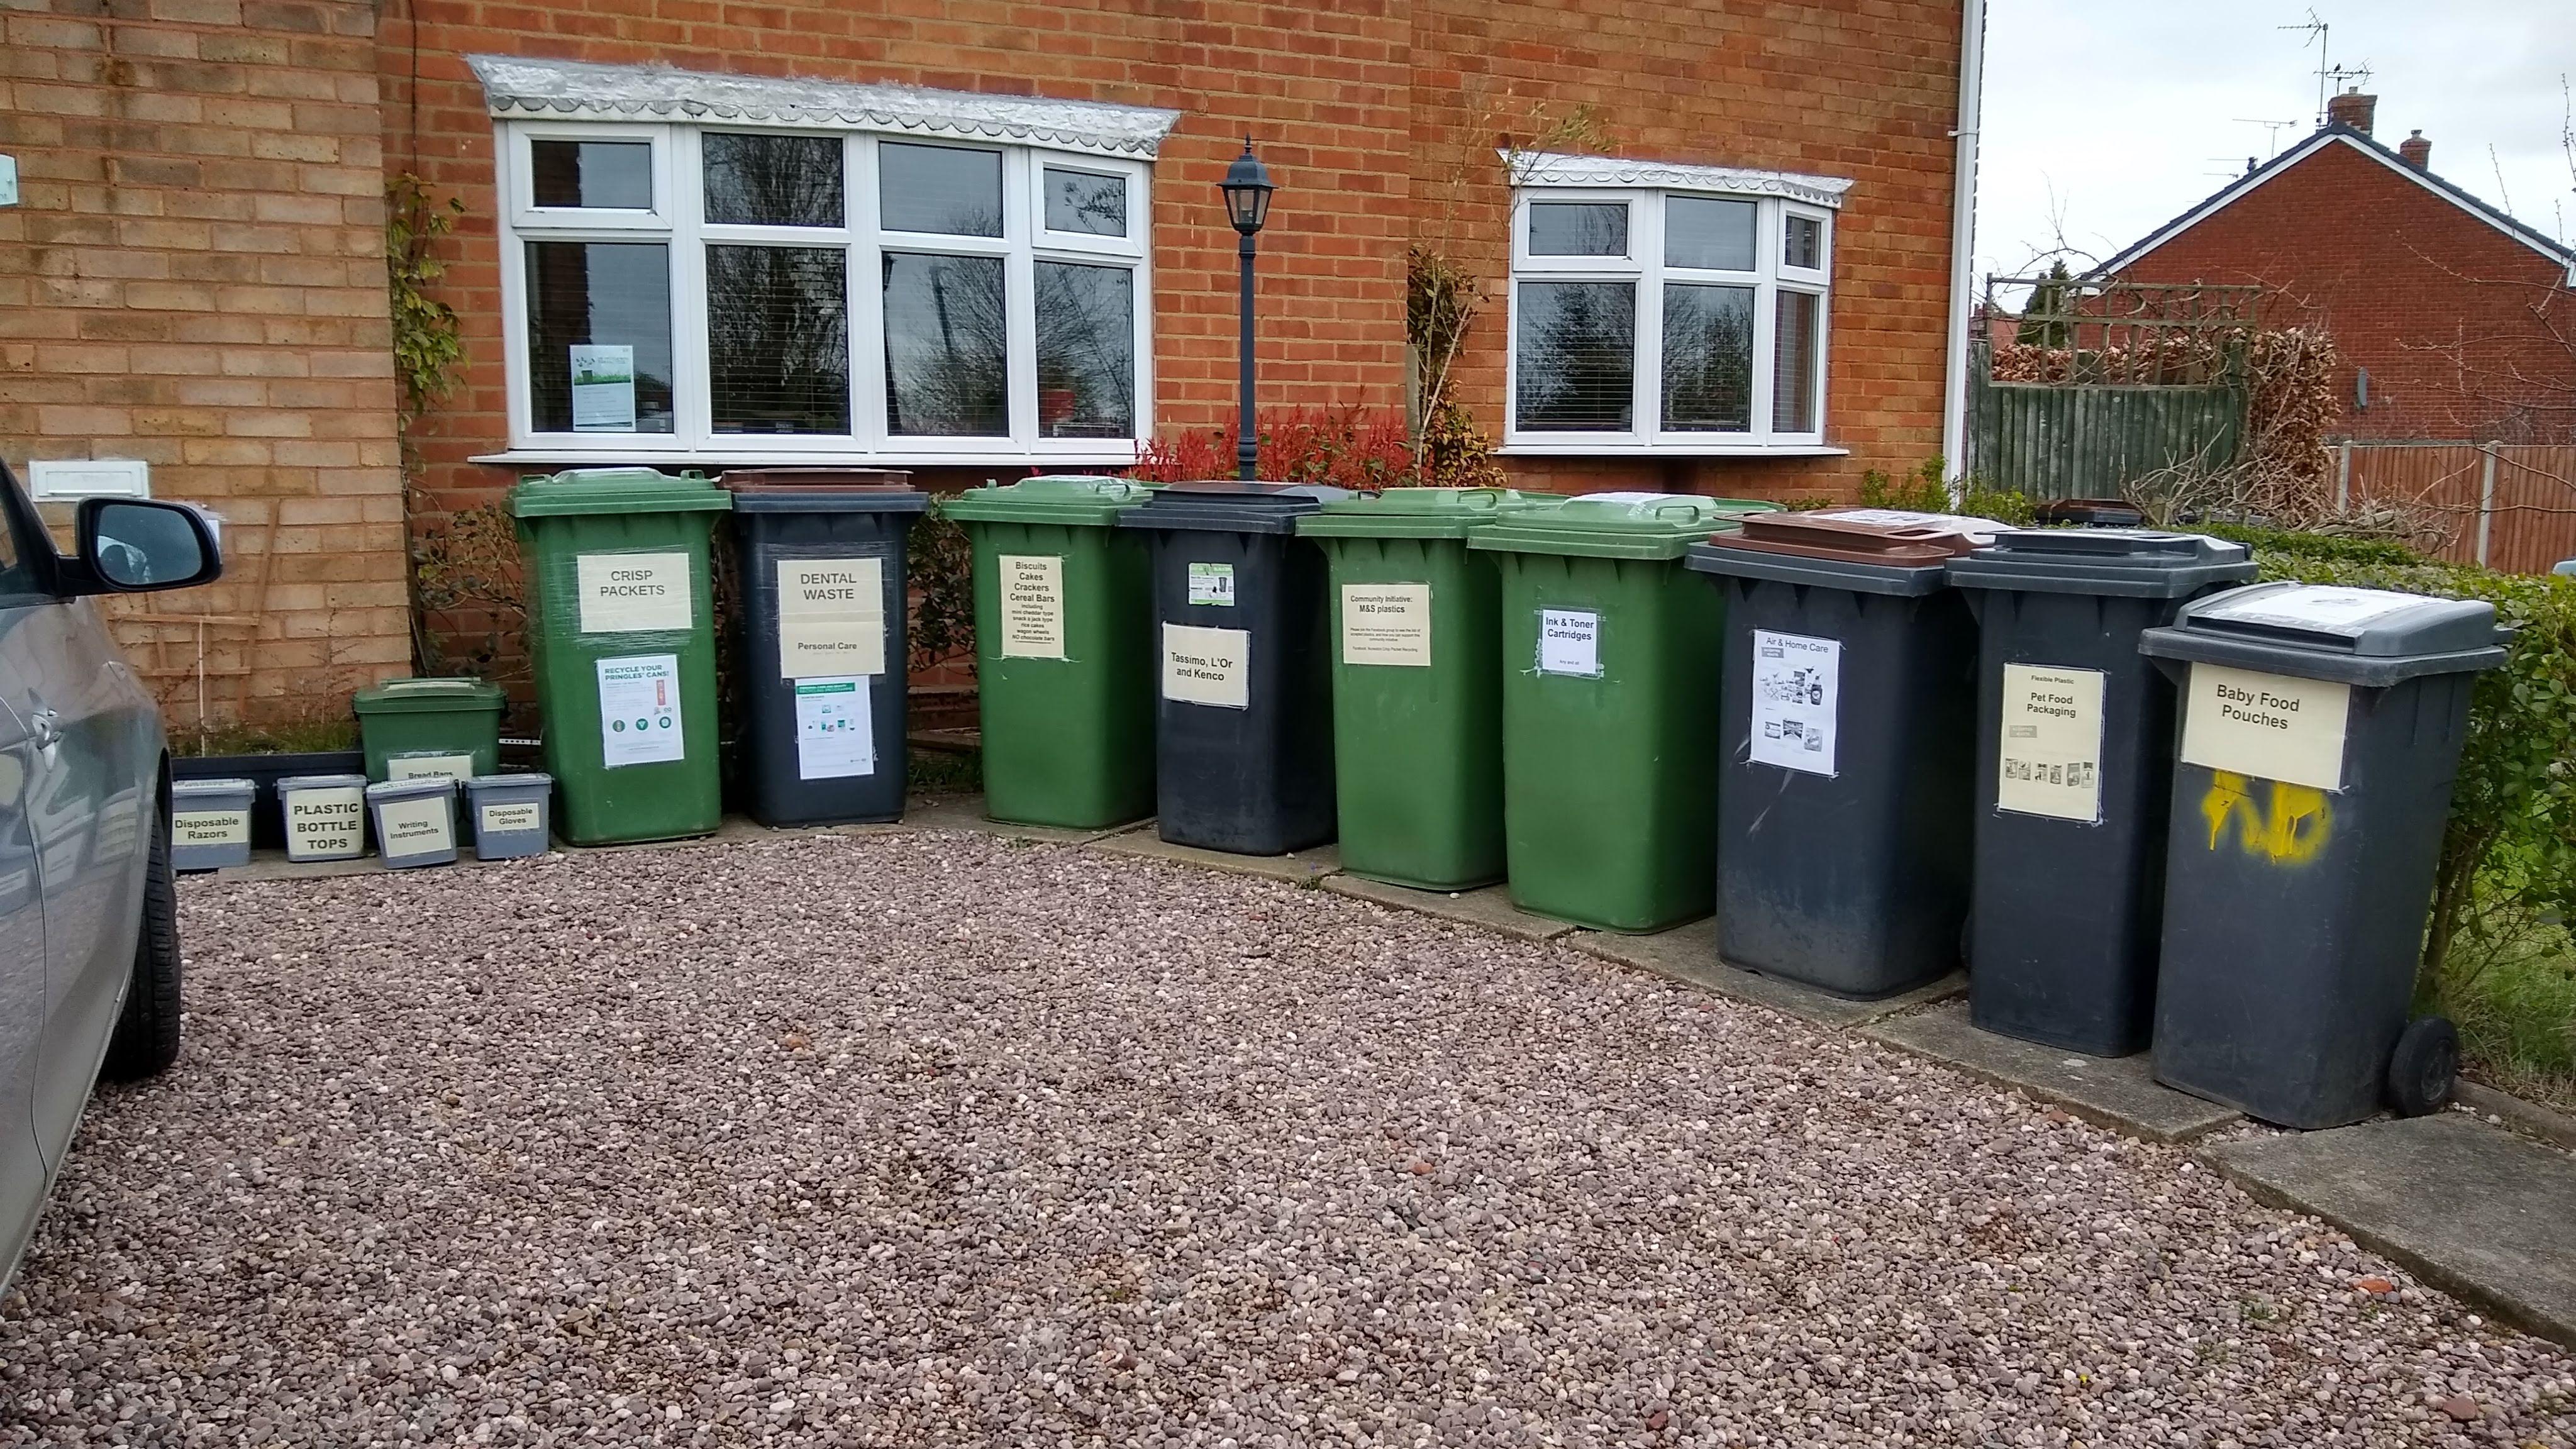 Recycling at 45 Atholl Crescent, Nuneaton